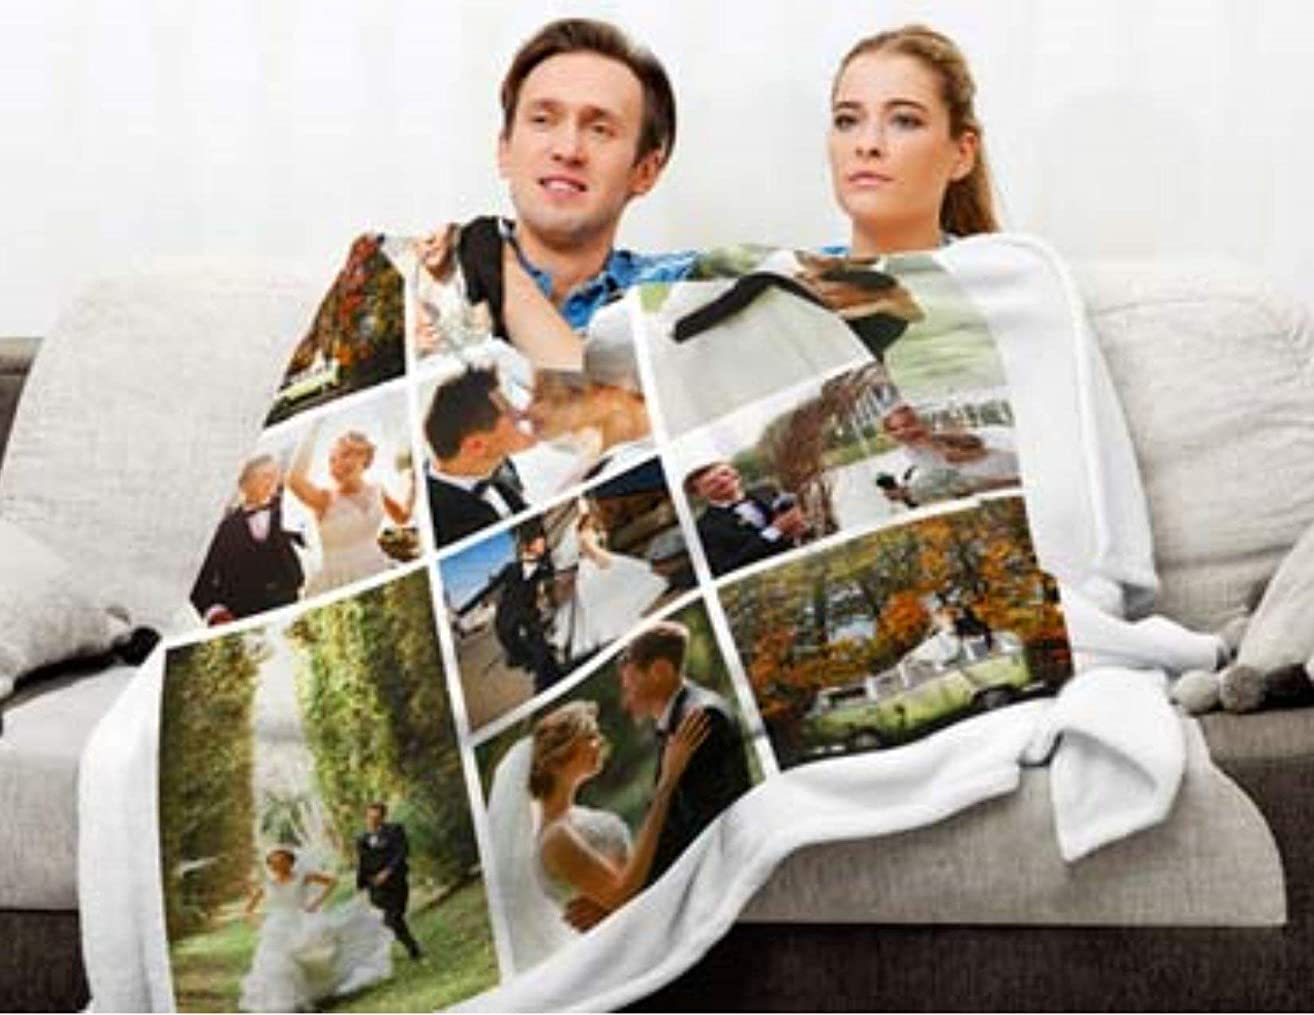 Family Photo Blanket- Custom Photo Blanket- Personalized Blanket- Minky Blanket- Custom Blanket- Personalized Throw- Plush Baby Blanket-Photo Gift